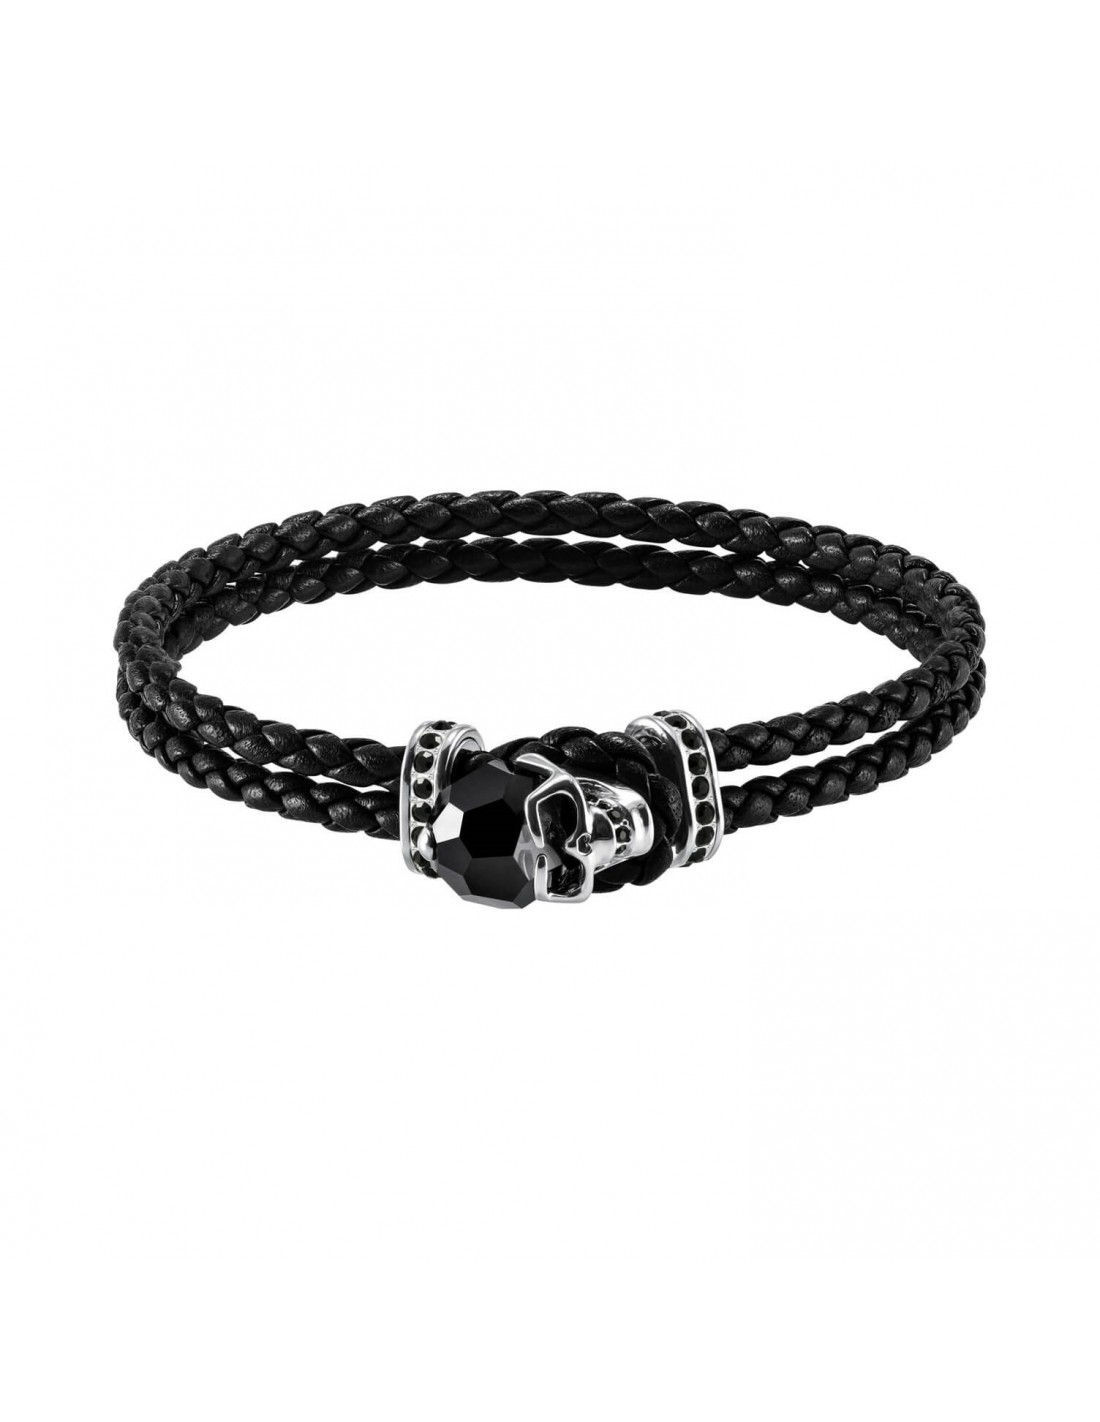 21299a876995 Taddeo bracelet swarovski men s jewelry palladium plating 5448905